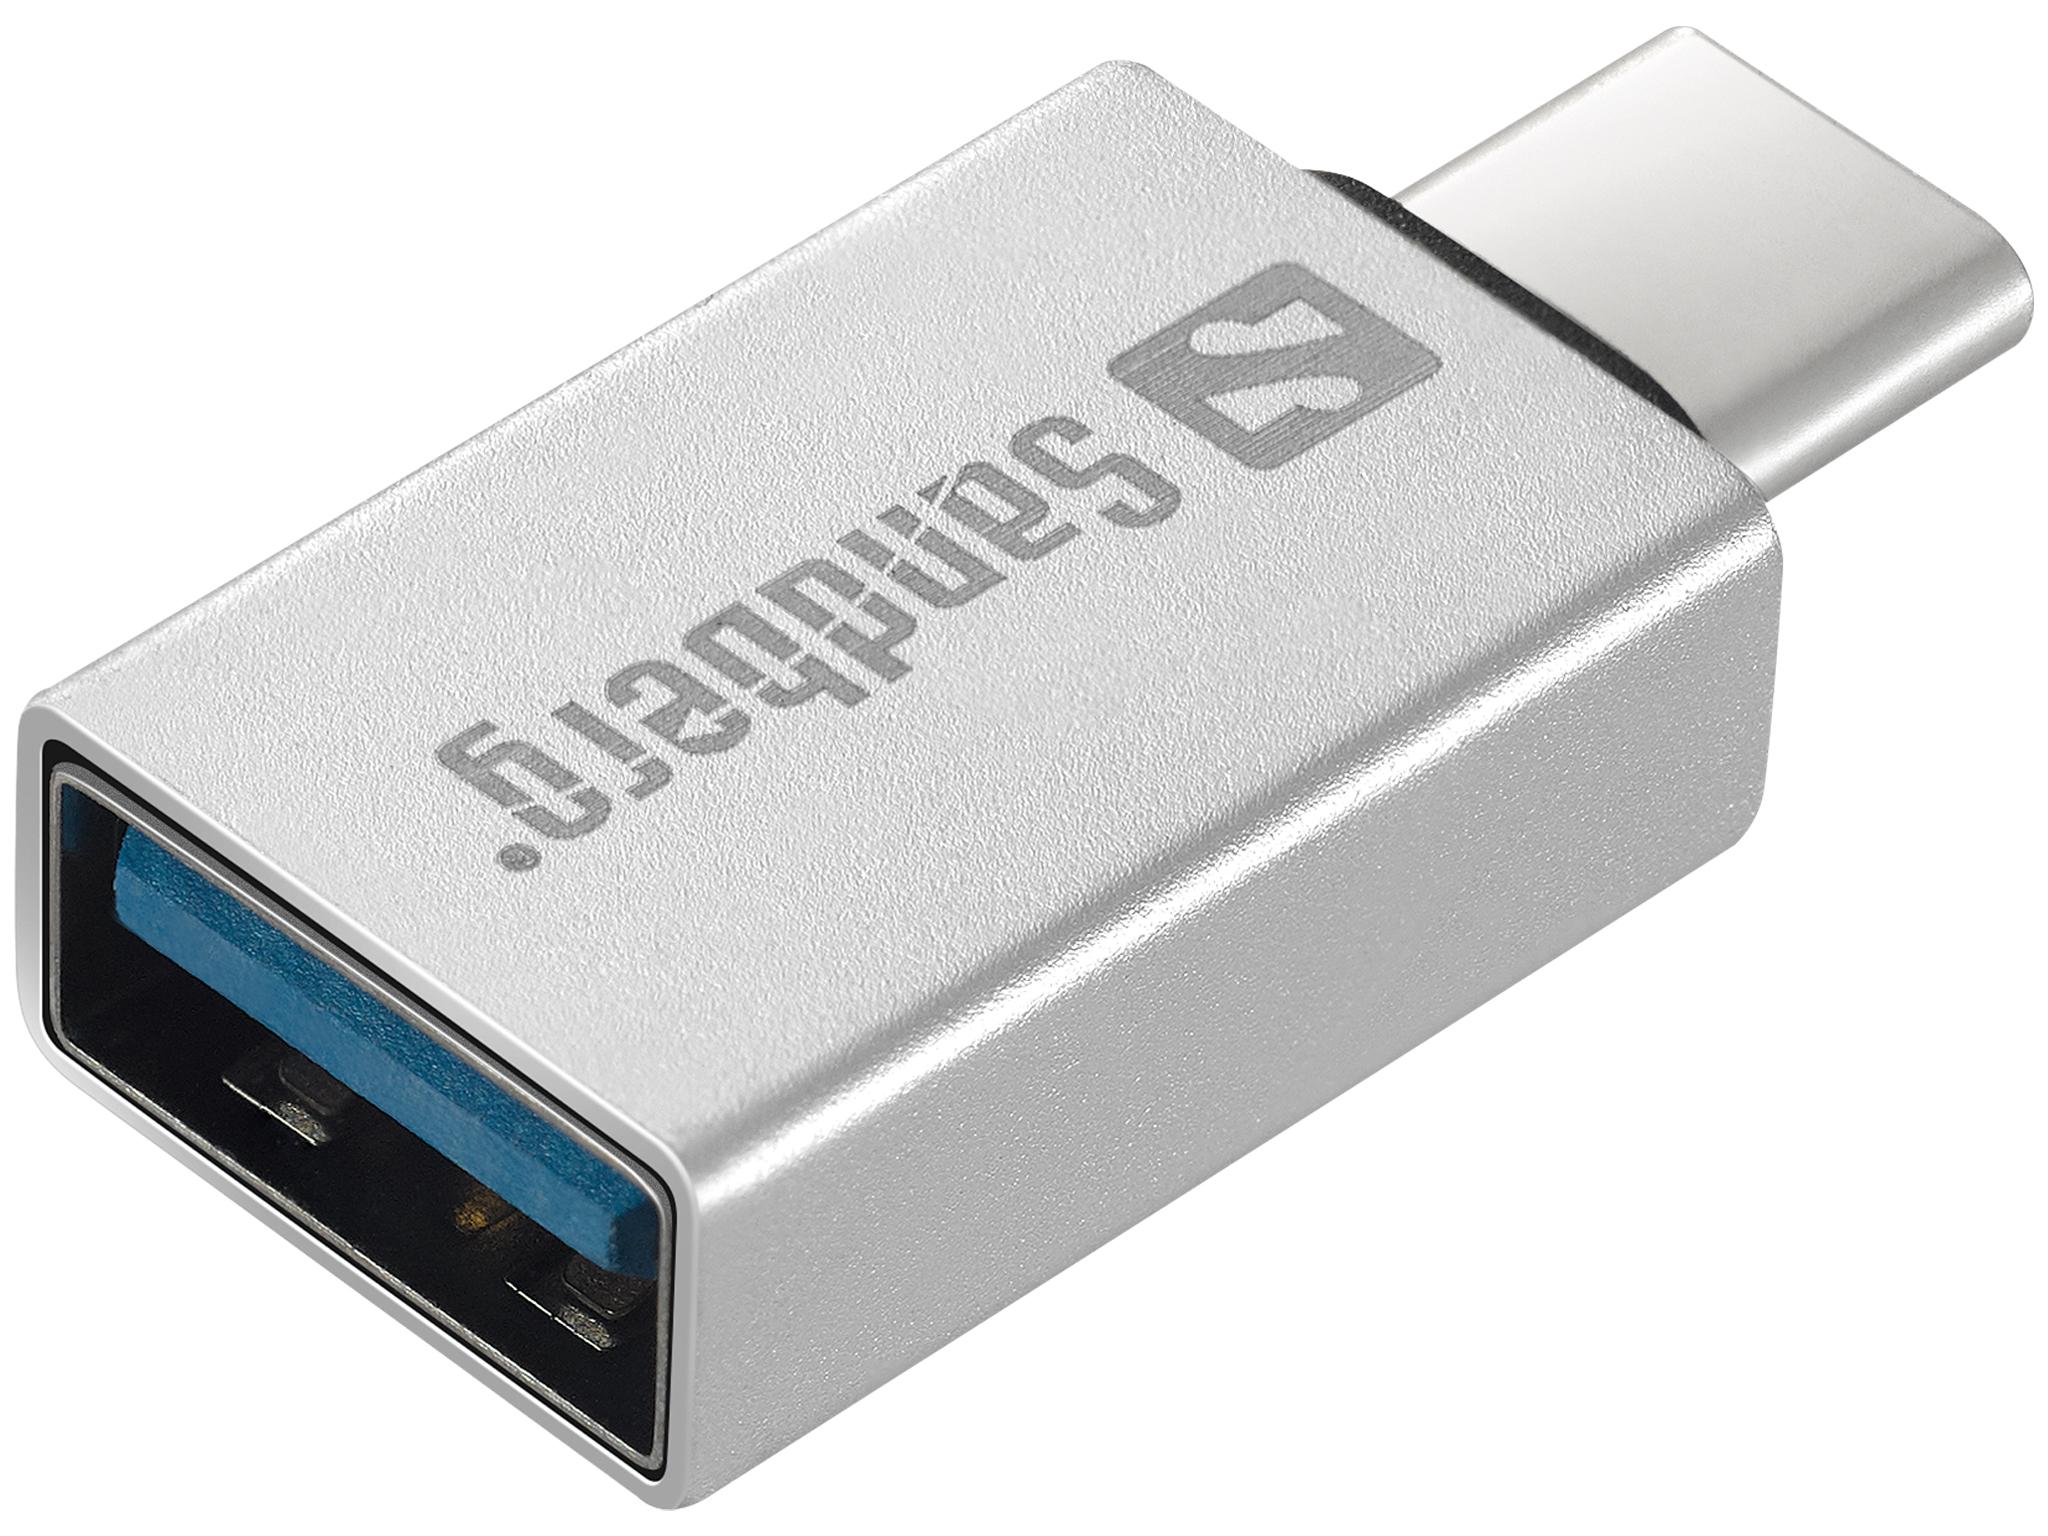 USB-C to USB 3.0 Dongle